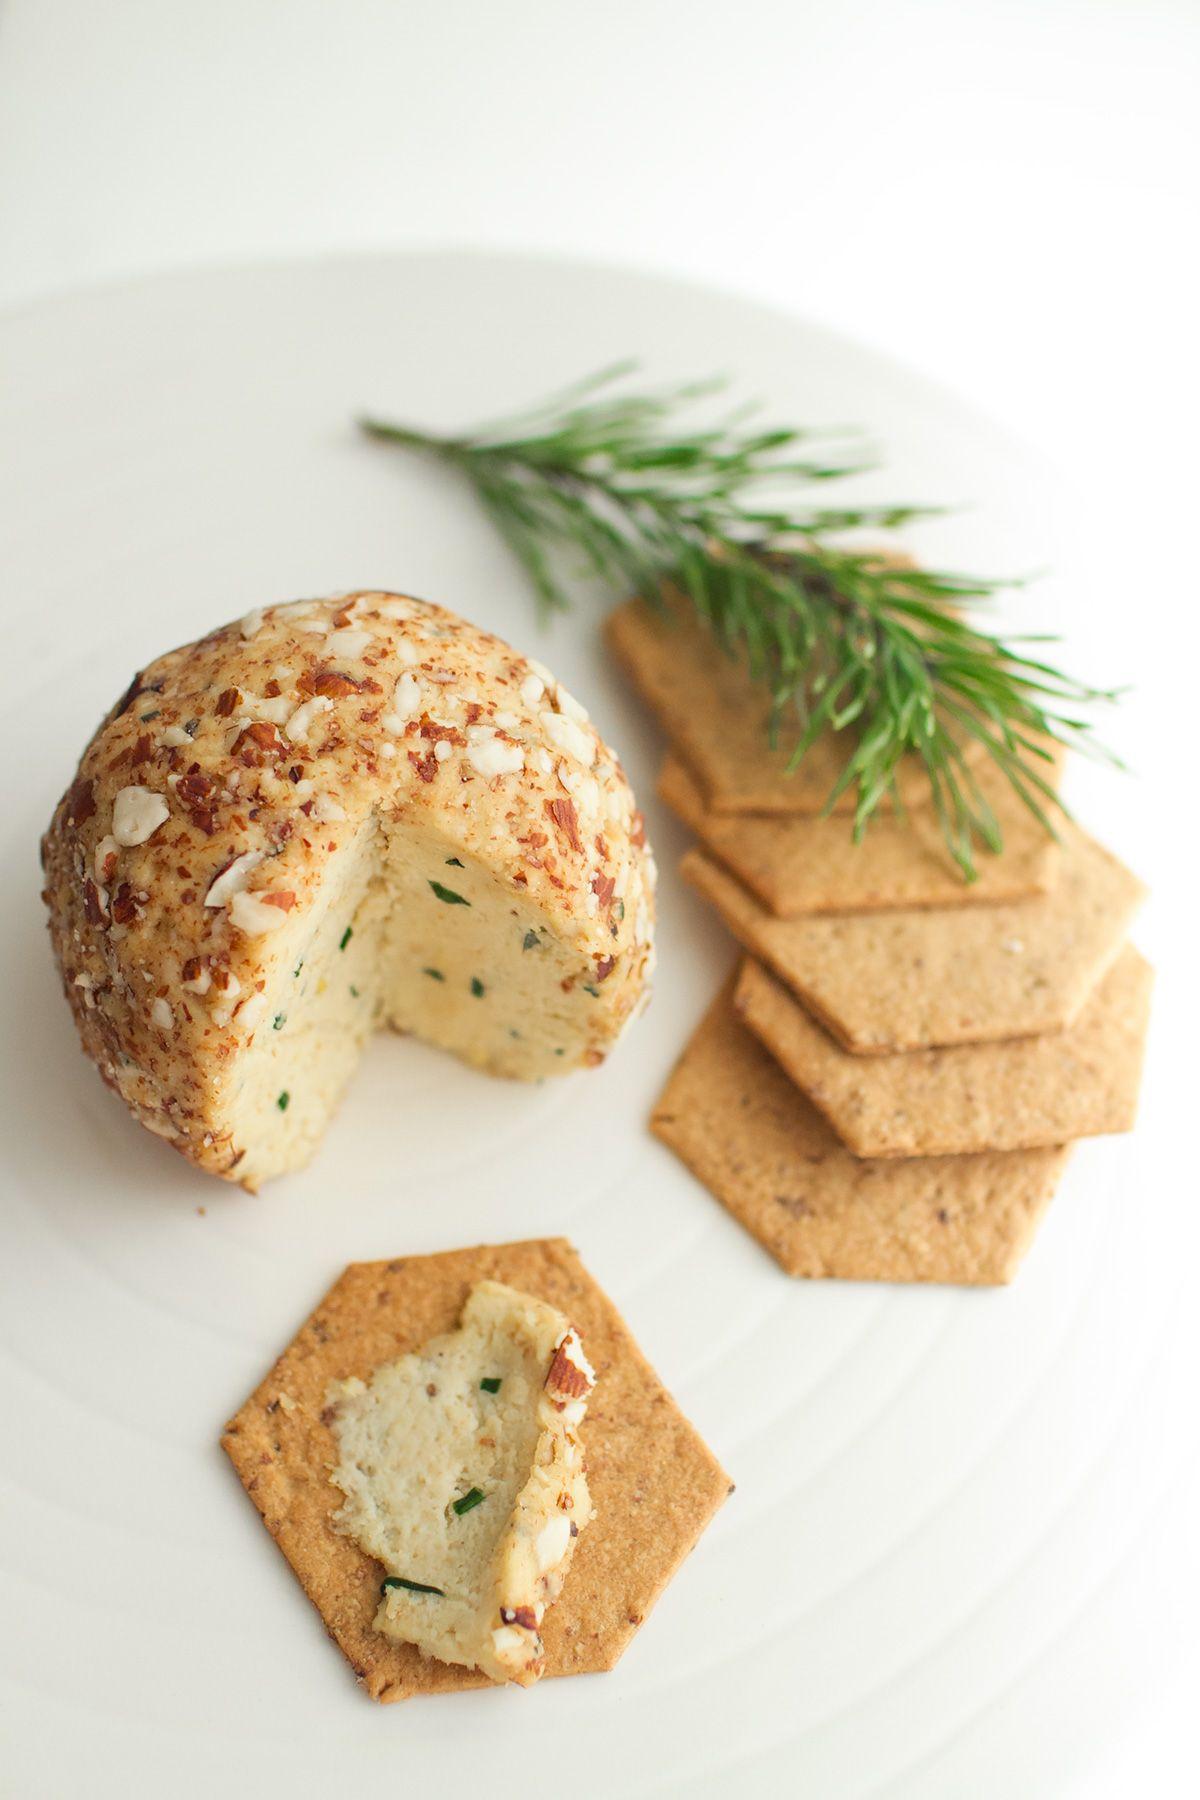 vegan christmas soft cheese - tofu, almonds, pine nuts and herbs.